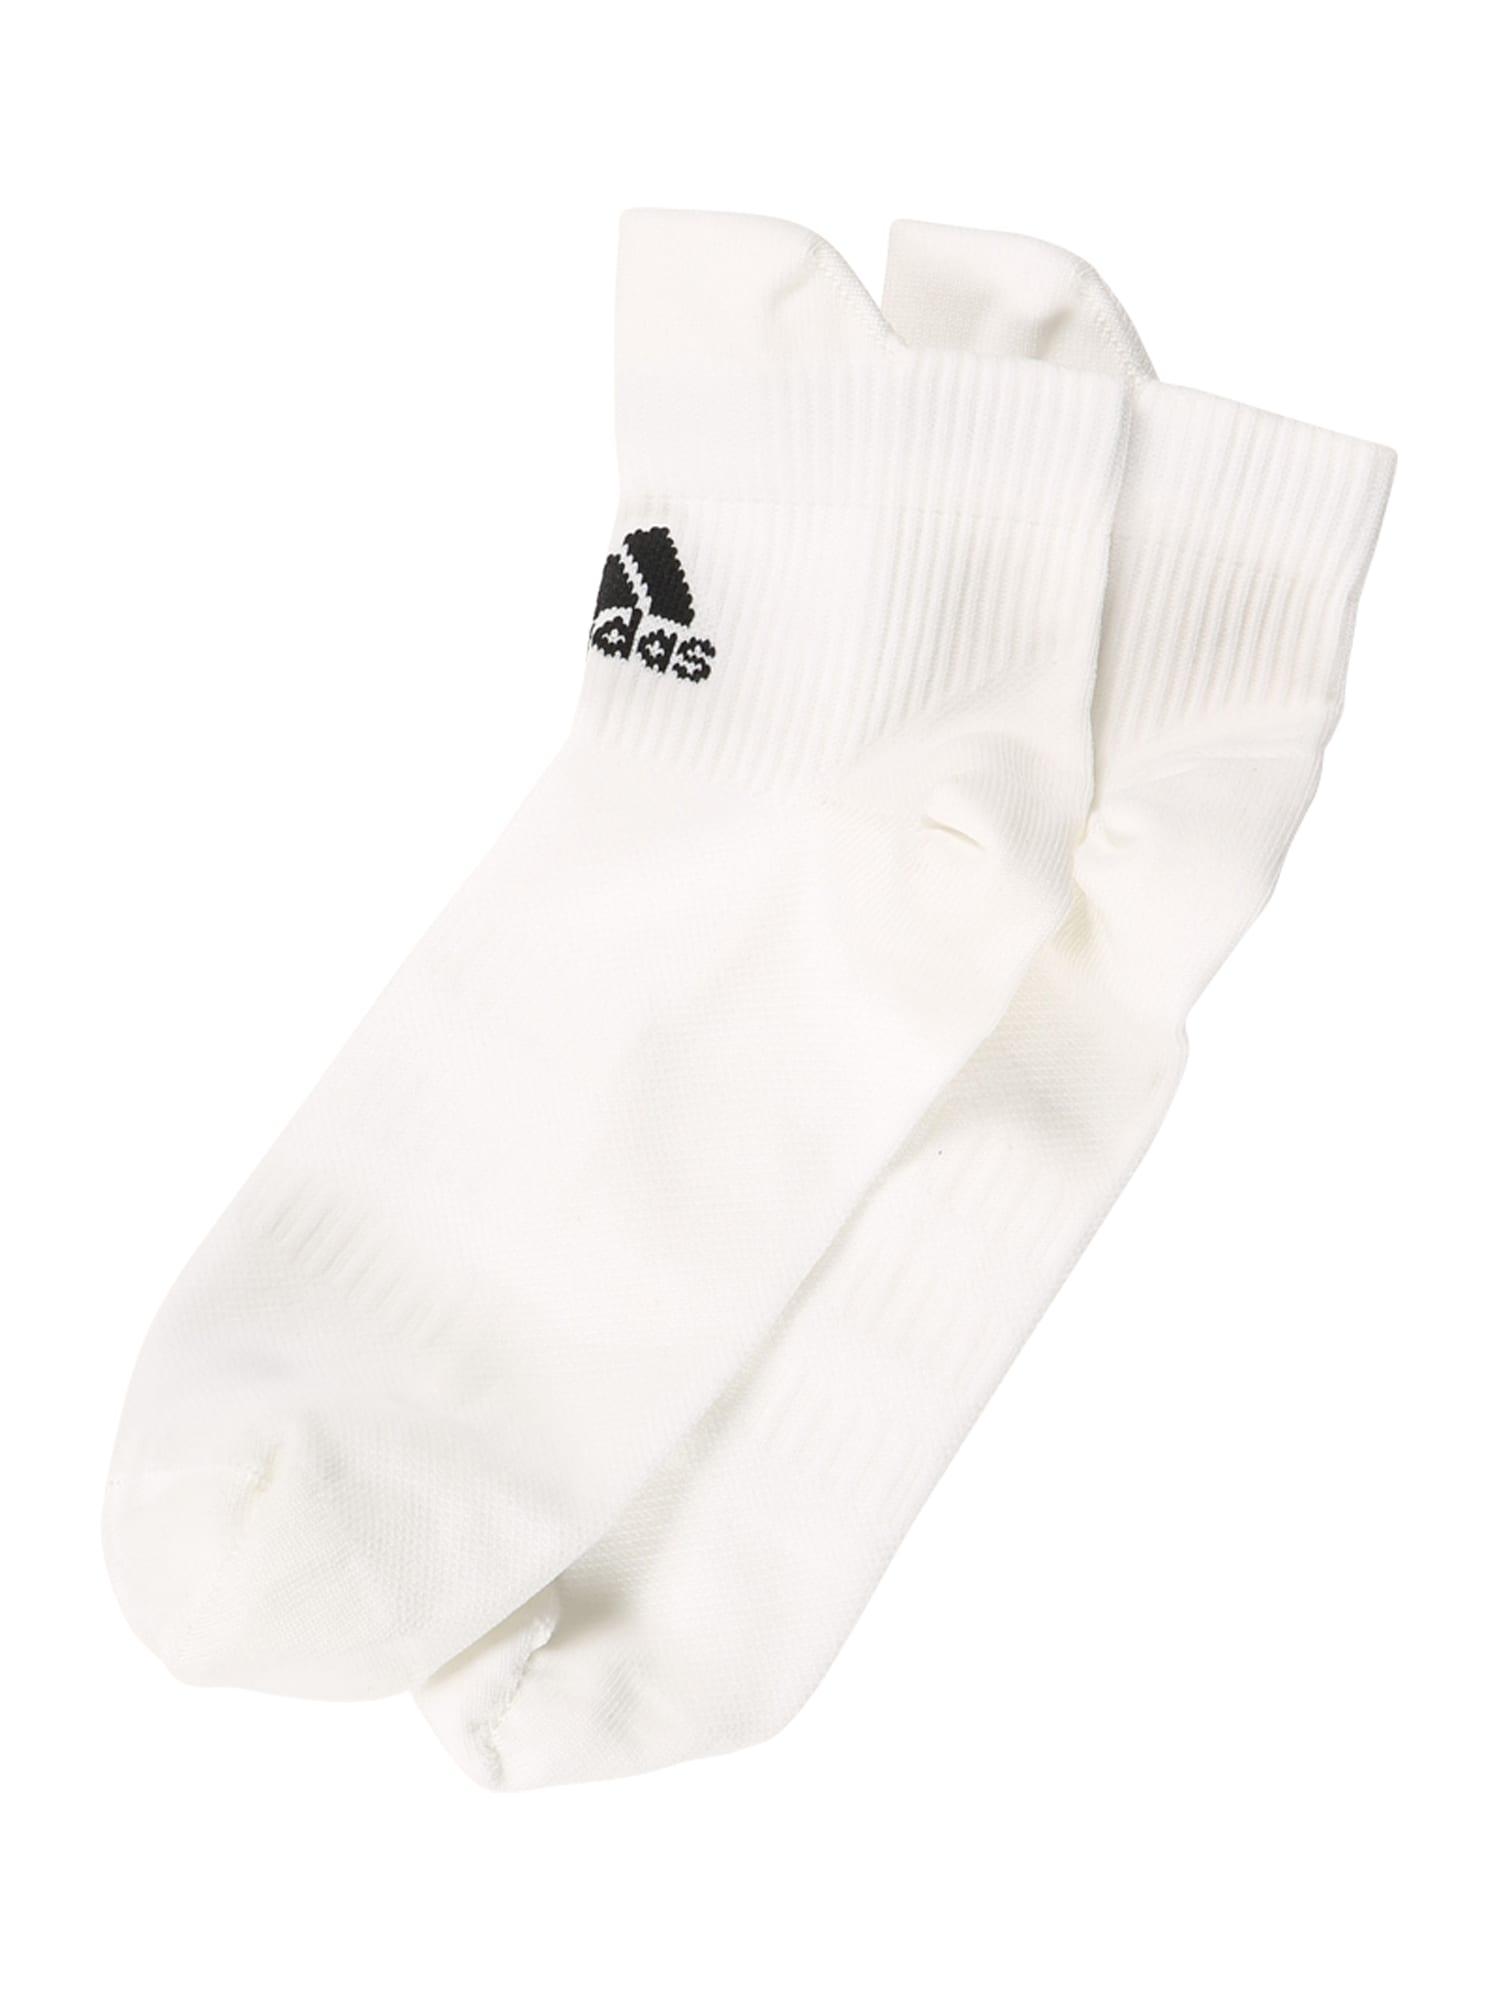 ADIDAS PERFORMANCE Chaussettes de sport  - Blanc - Taille: XS - male